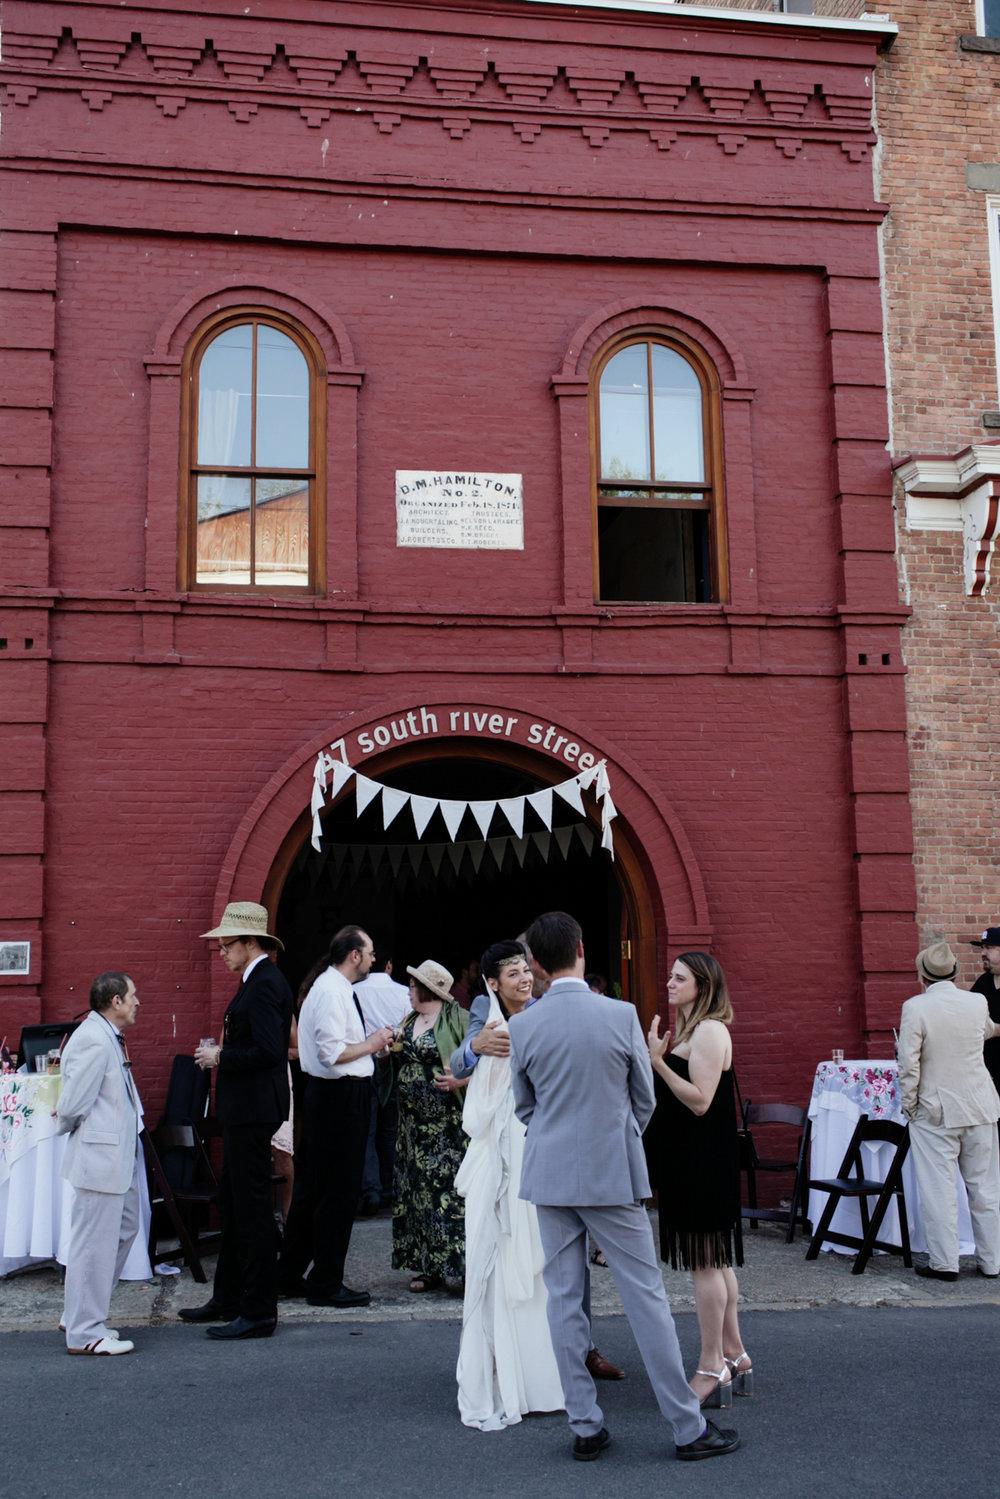 Kimberly-Coccagnia-Wedding-Photographer-204.JPG